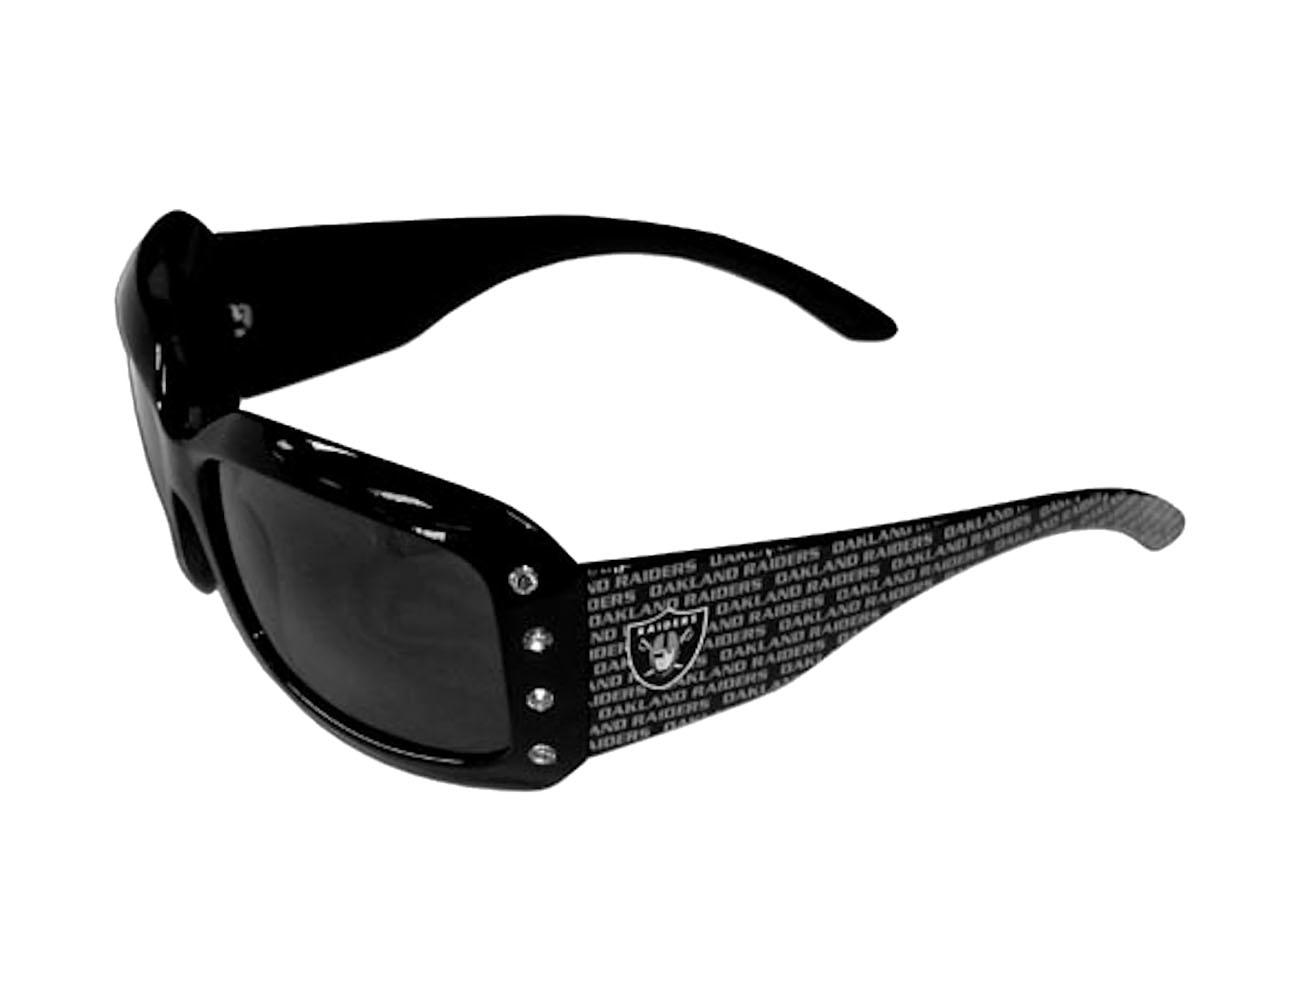 3248d6dff4 NFL Green Bay Packers Women s Designer Sunglasses with Rhinestones -  Walmart.com